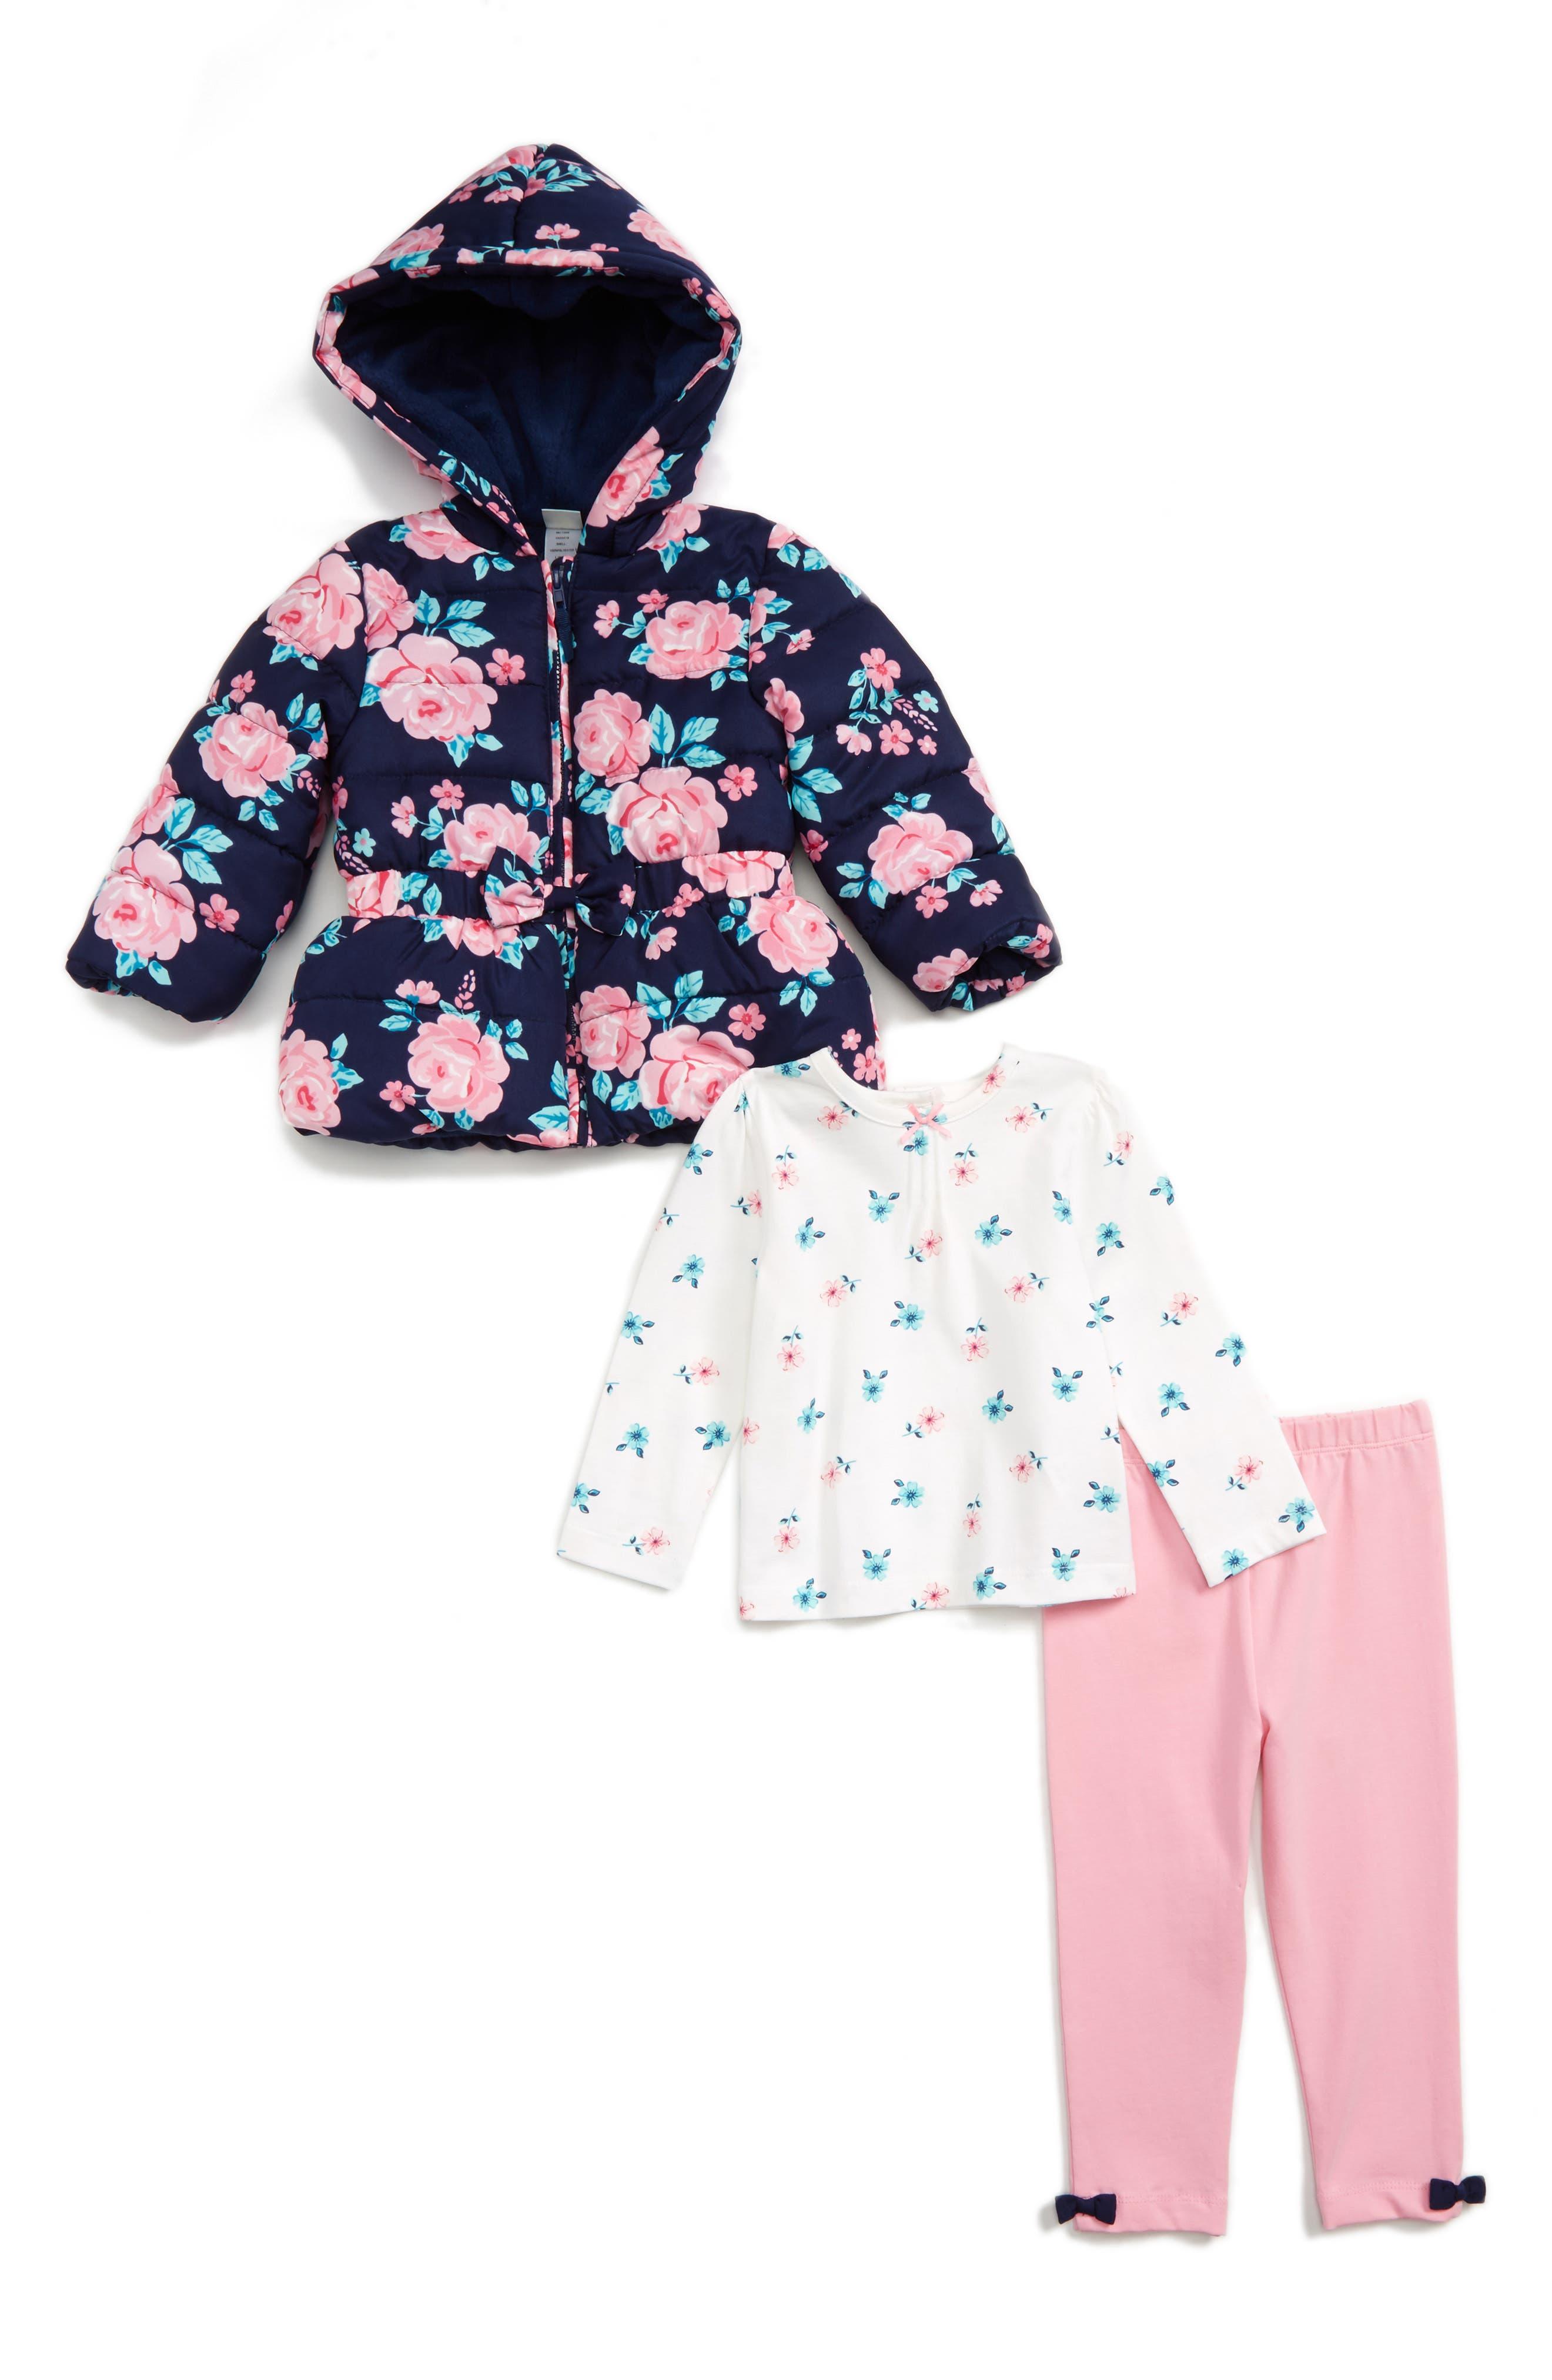 LITTLE ME Hooded Jacket, Tee & Leggings Set